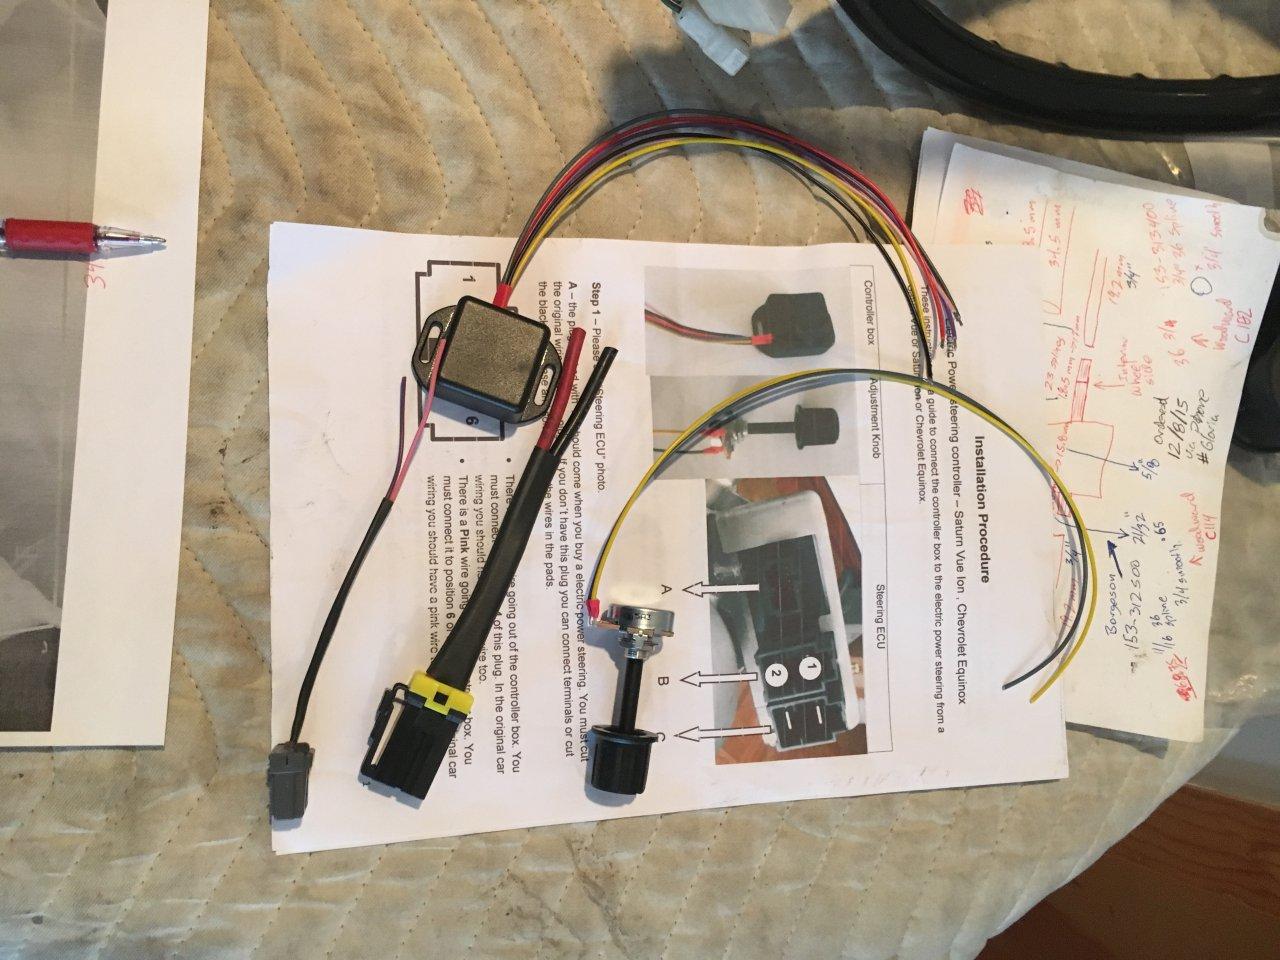 saturn ion wiring diagram 2004 honda odyssey headlight diy electric power steering | ih8mud forum